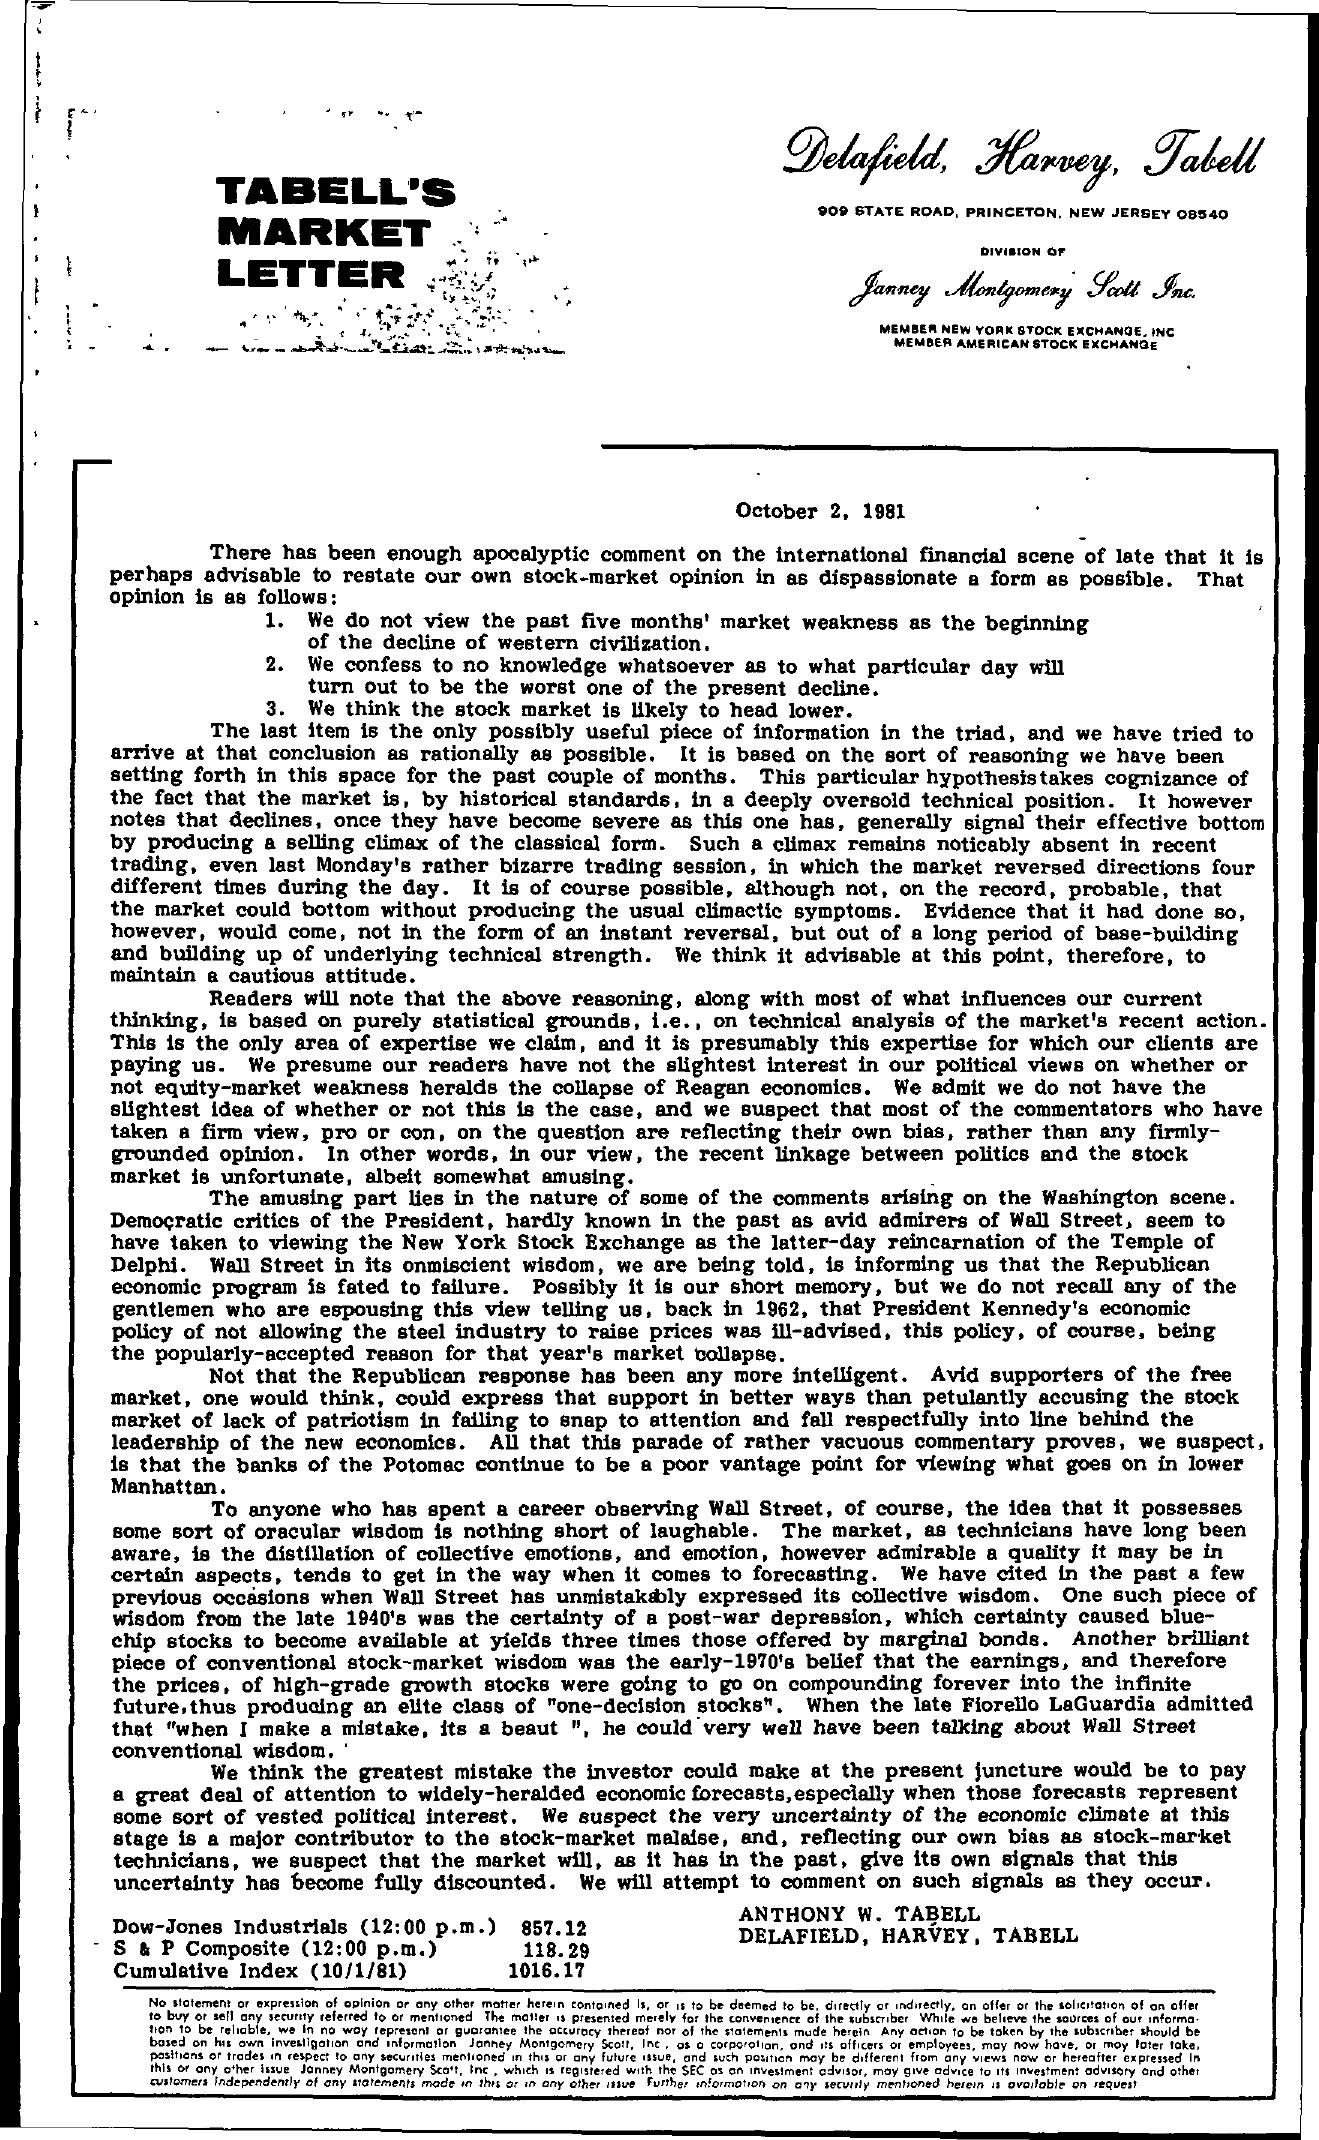 Tabell's Market Letter - October 02, 1981